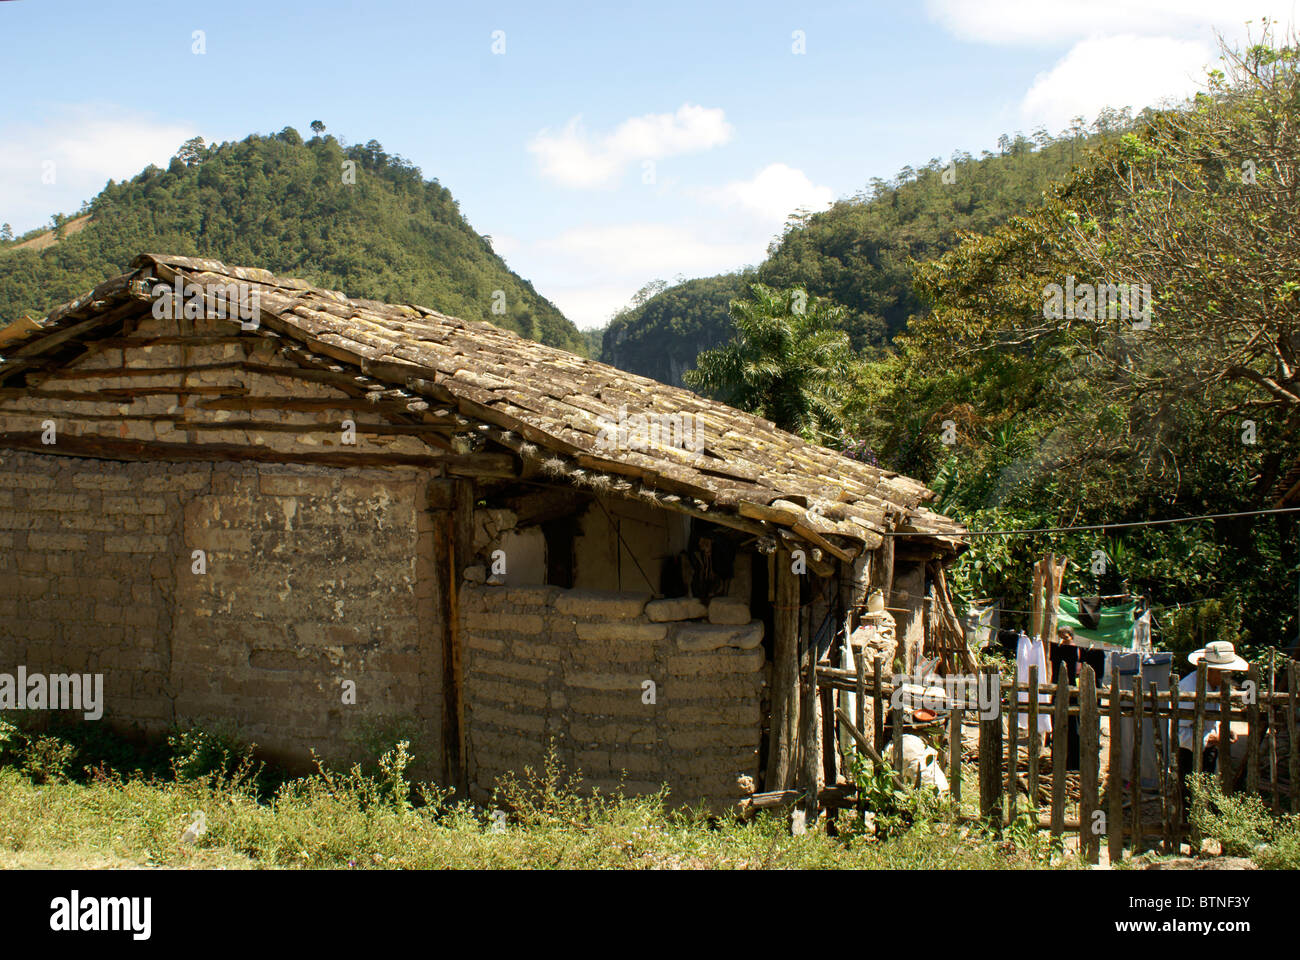 Typical Rural Honduran House In The Lenca Indian Village Of La Campa Lempira Honduras